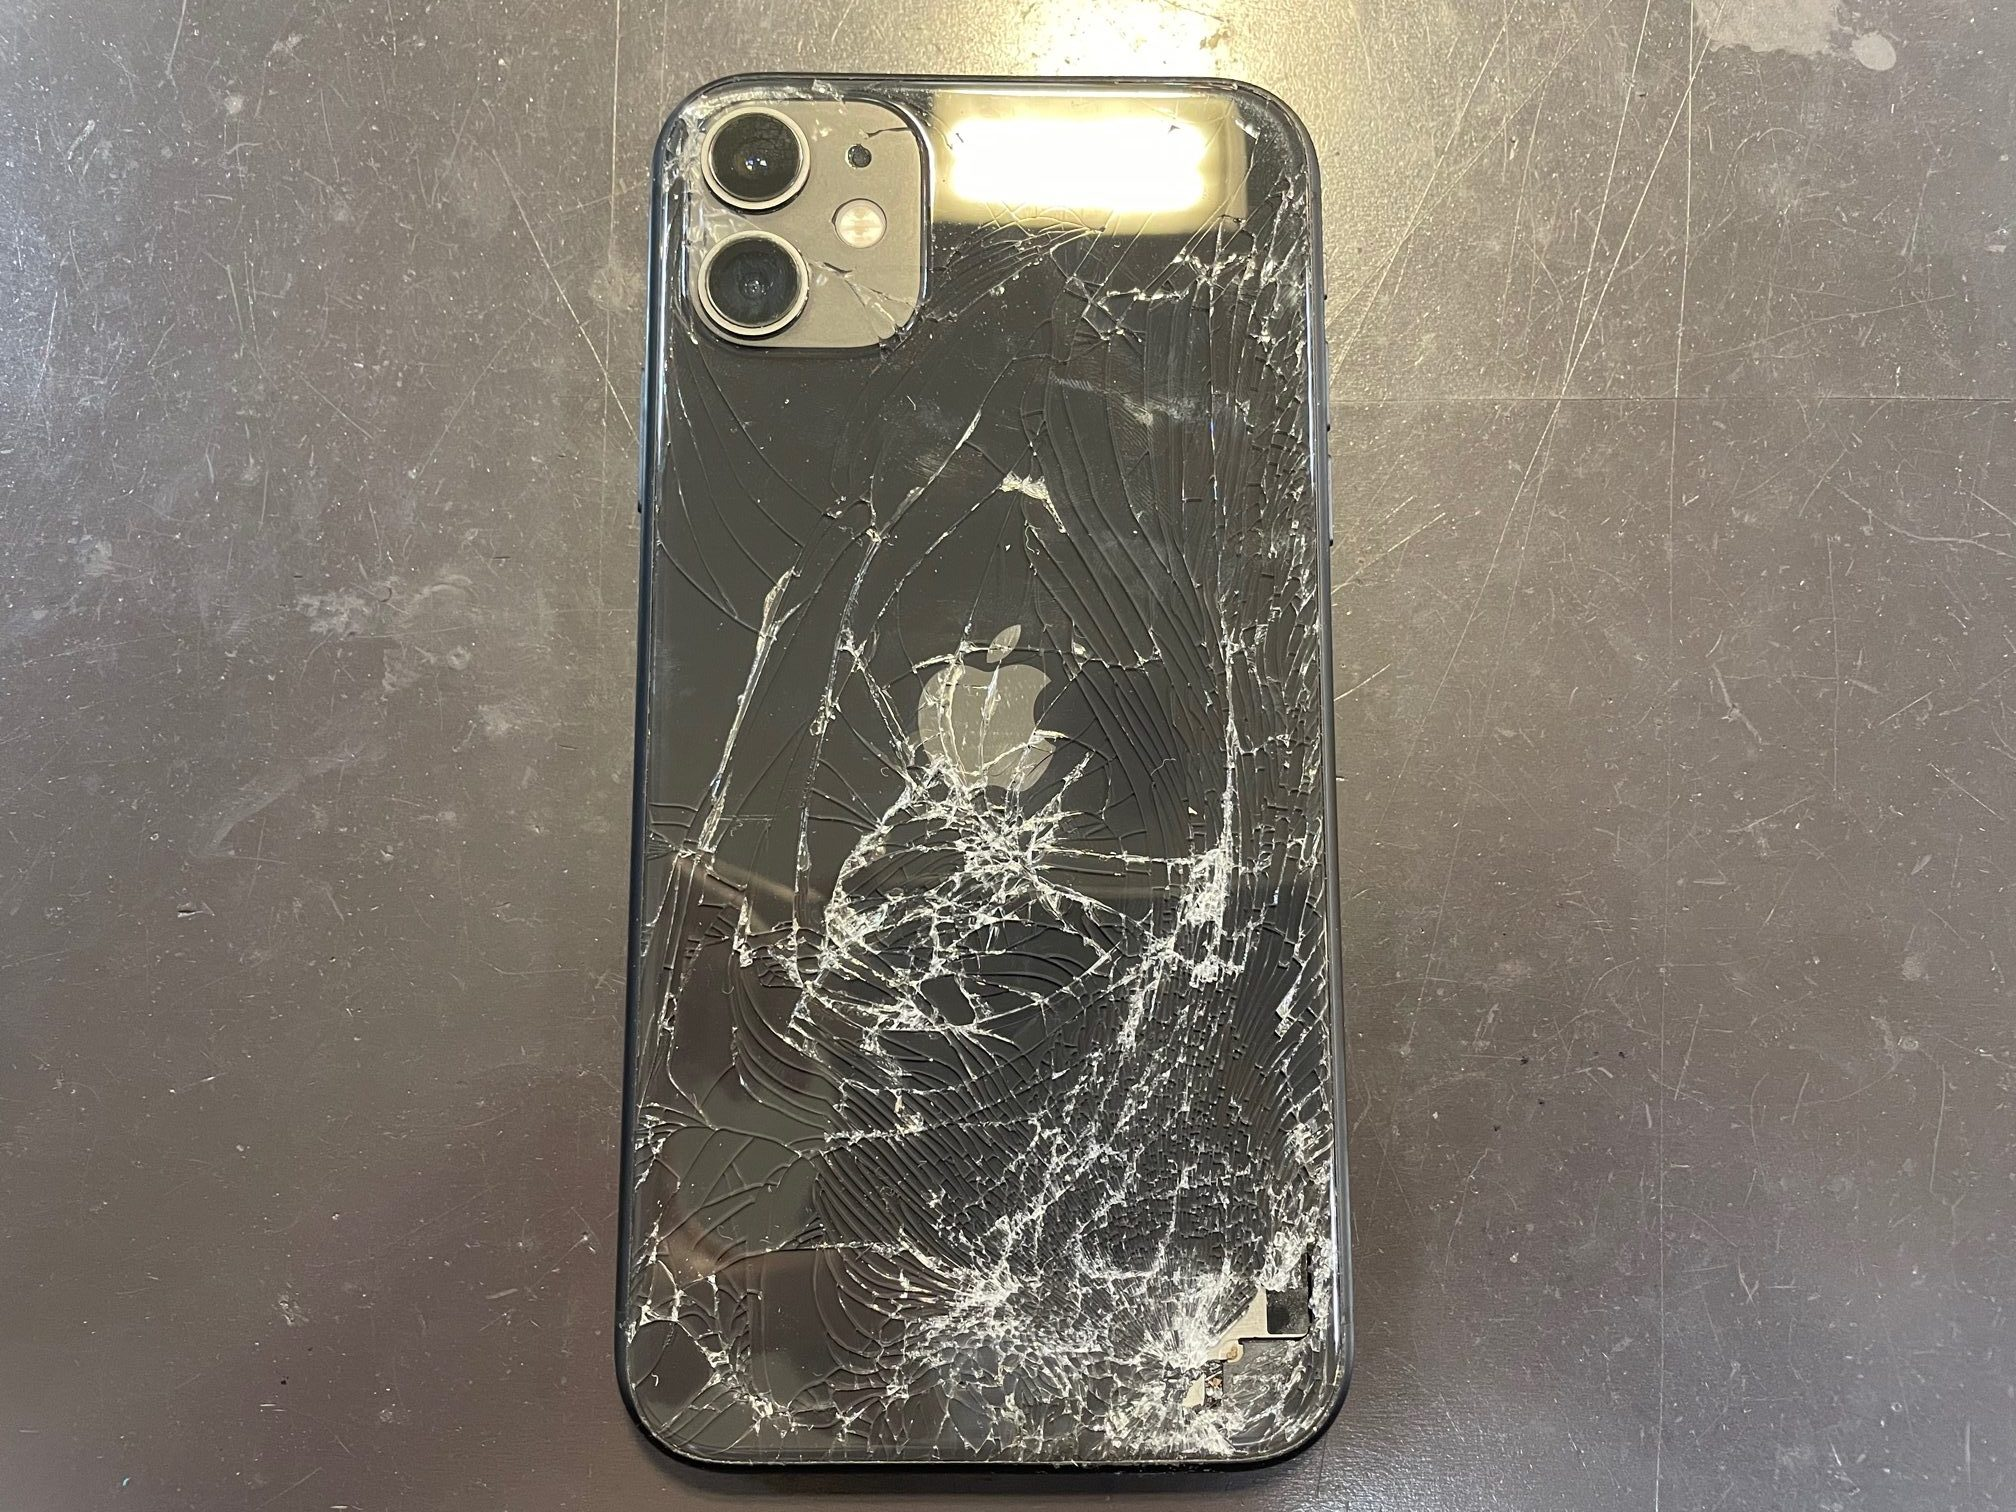 iPhone11の背面のガラス割れのお修理について【鈴鹿のiPhone修理店】